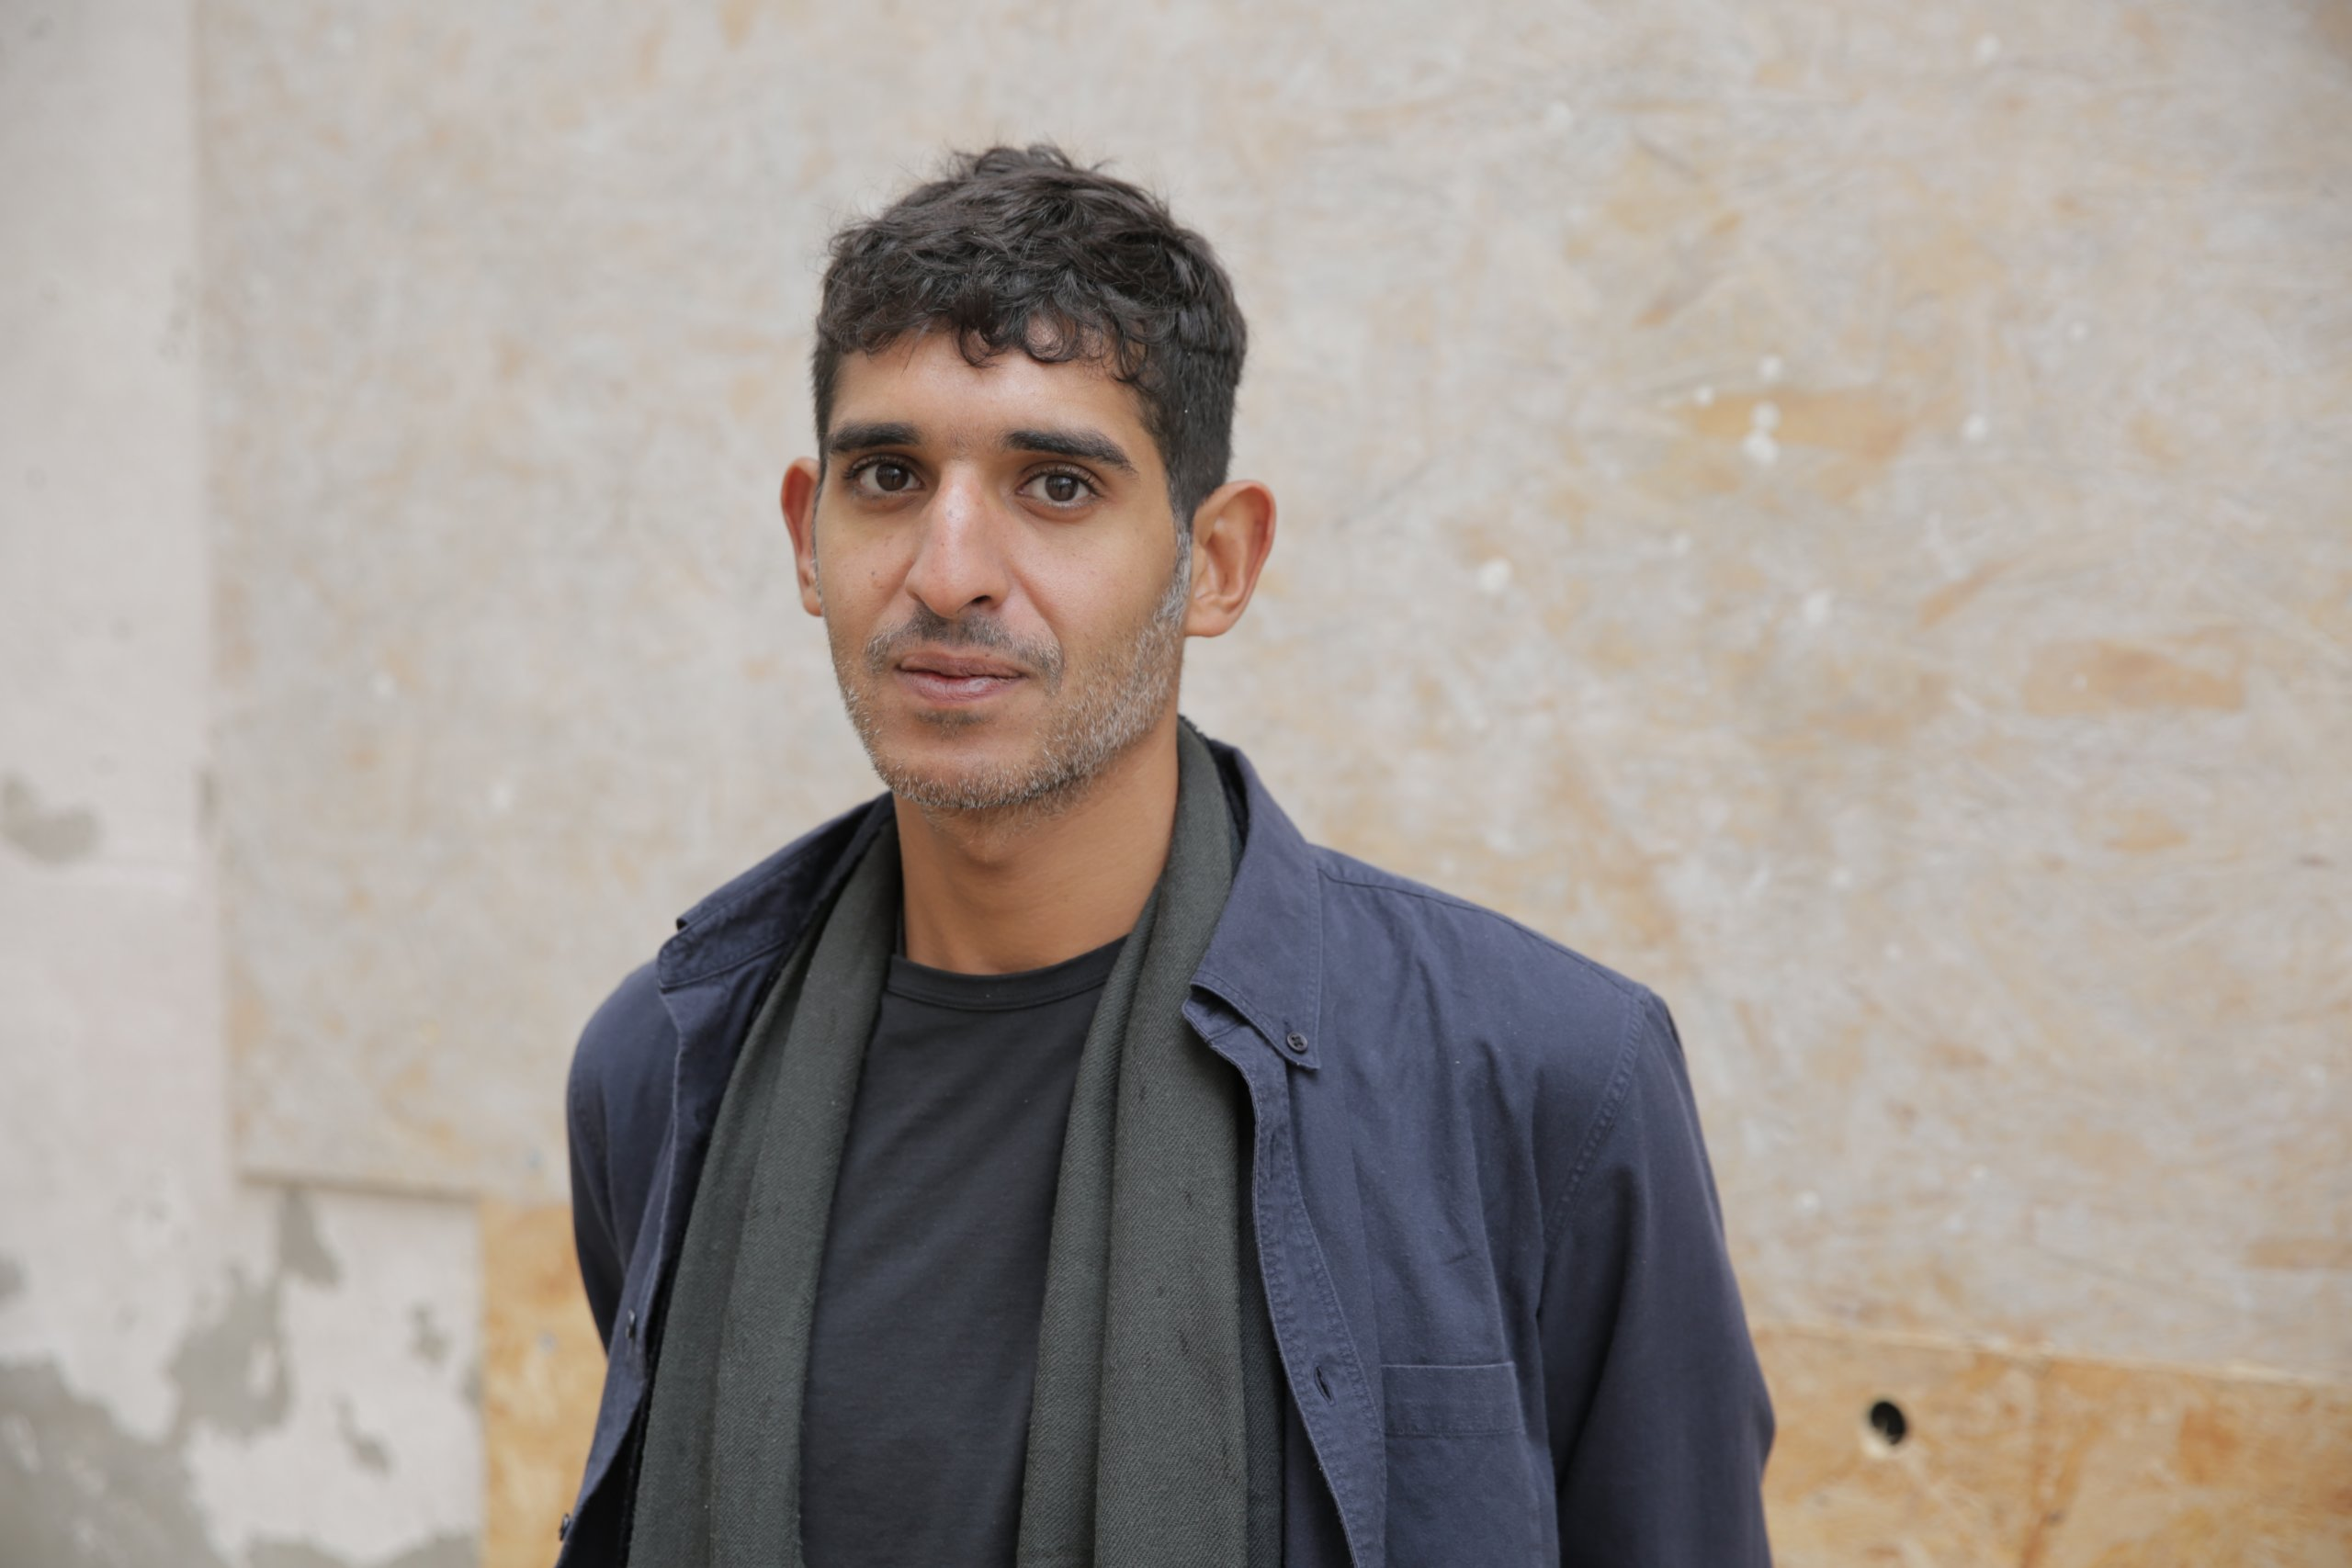 The Saudi architect Abdulrahman Gazzaz.